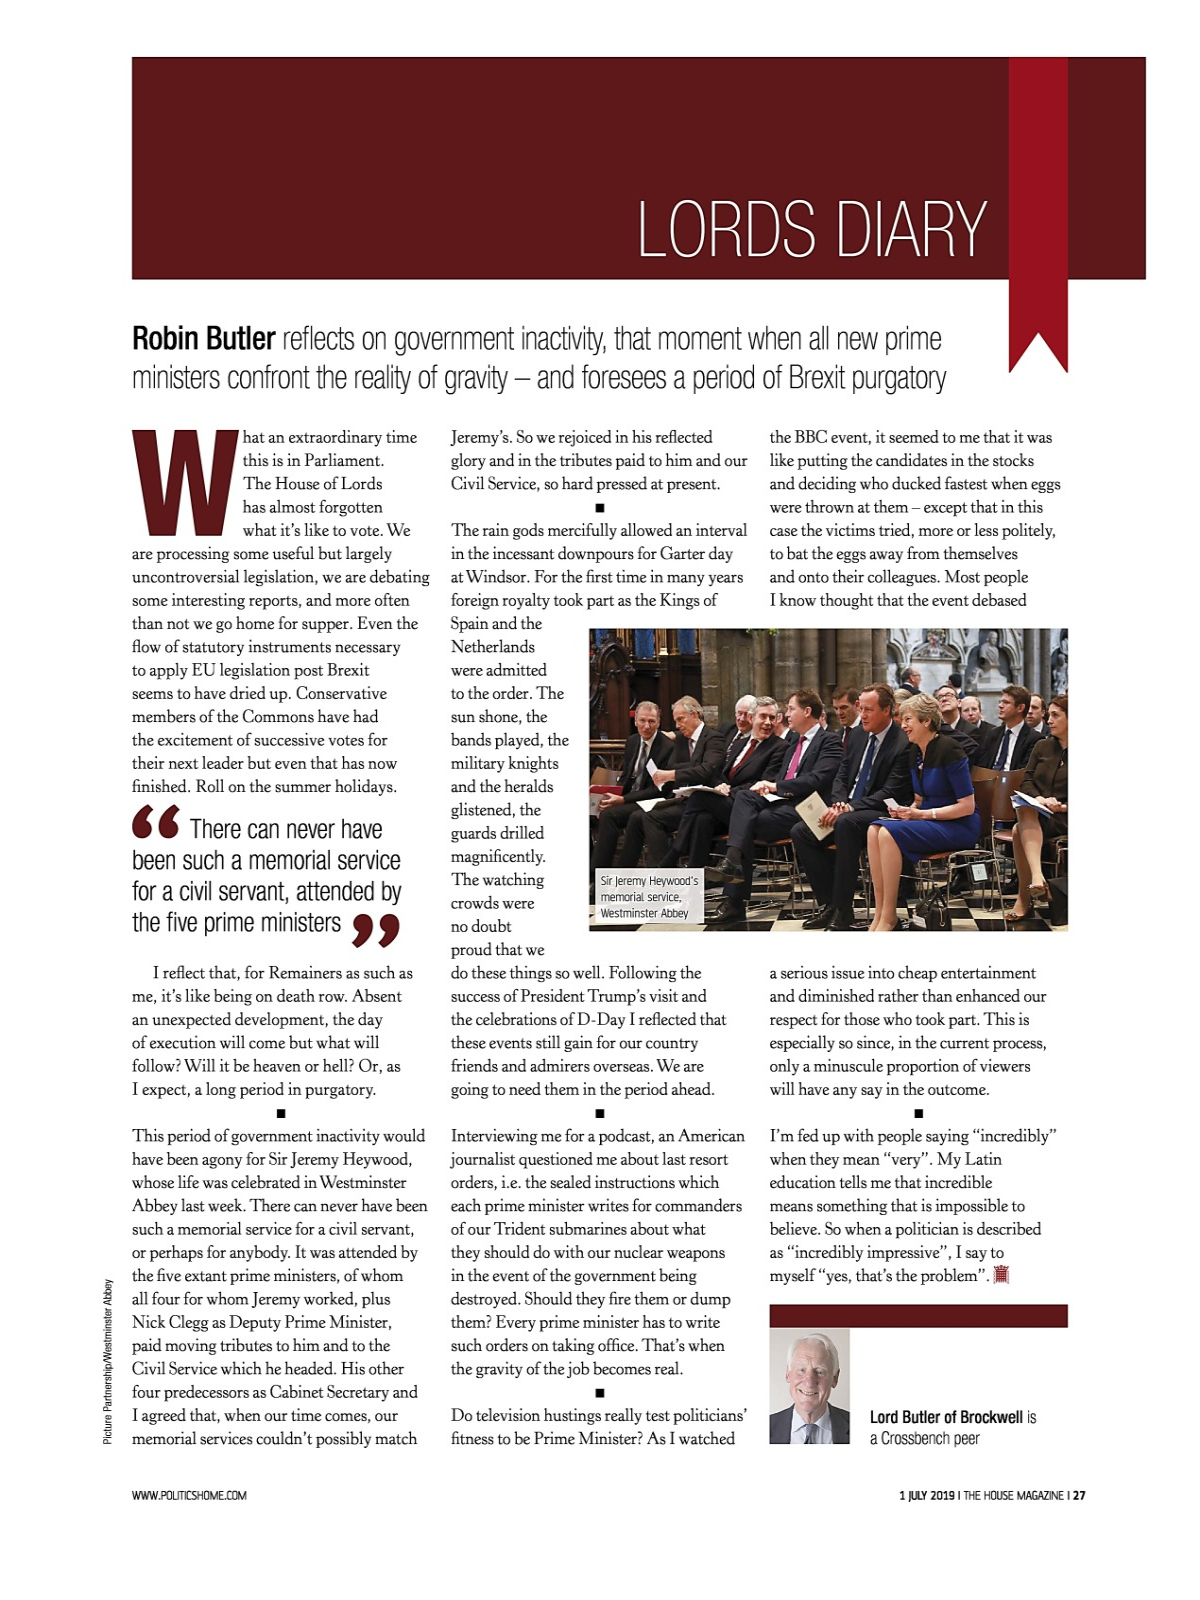 MYEBOOK - The House Magazine Issue 1658 - 01 July 2019